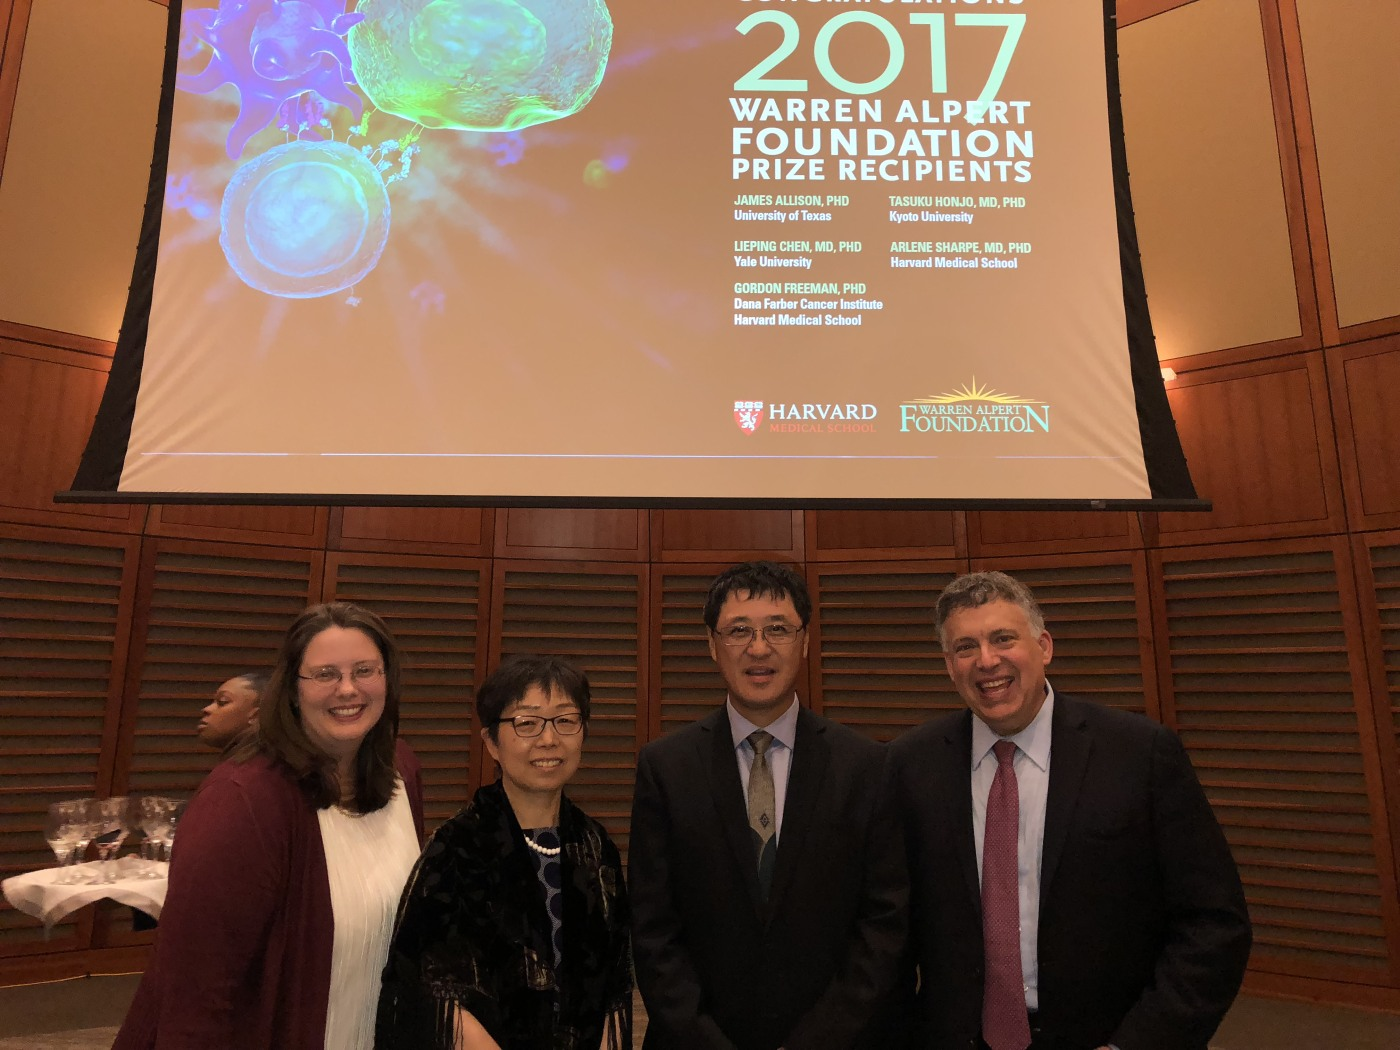 Lieping Chen receives Warren Alpert Foundation Prize